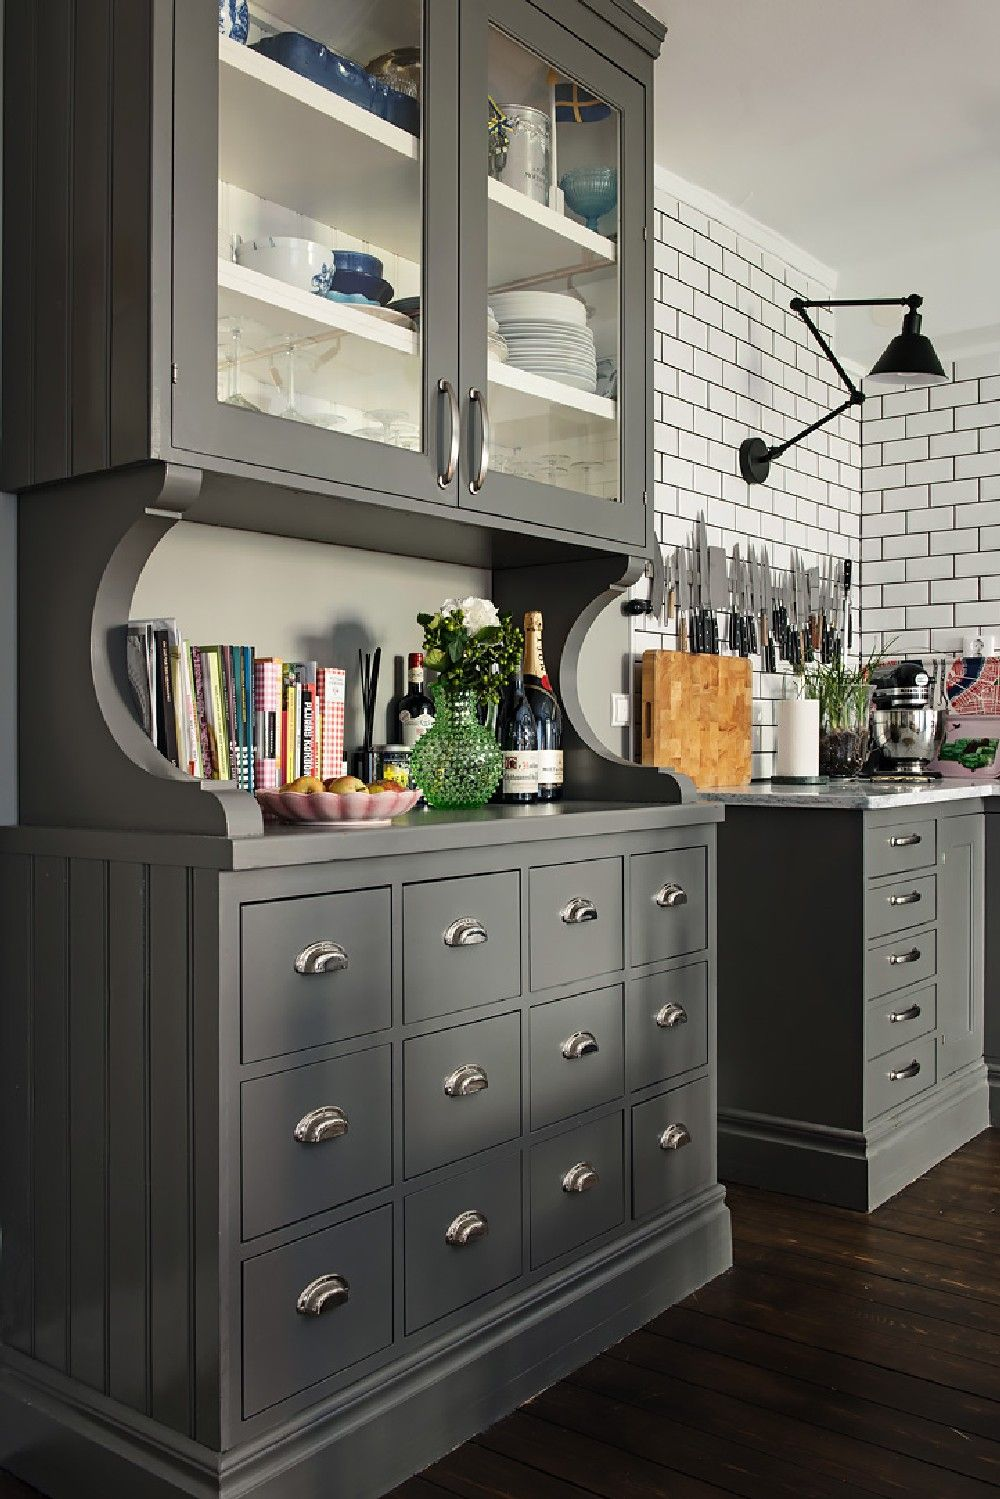 Gray Walls, Dark Wood Make For a Warm, Cozy Apartment ...